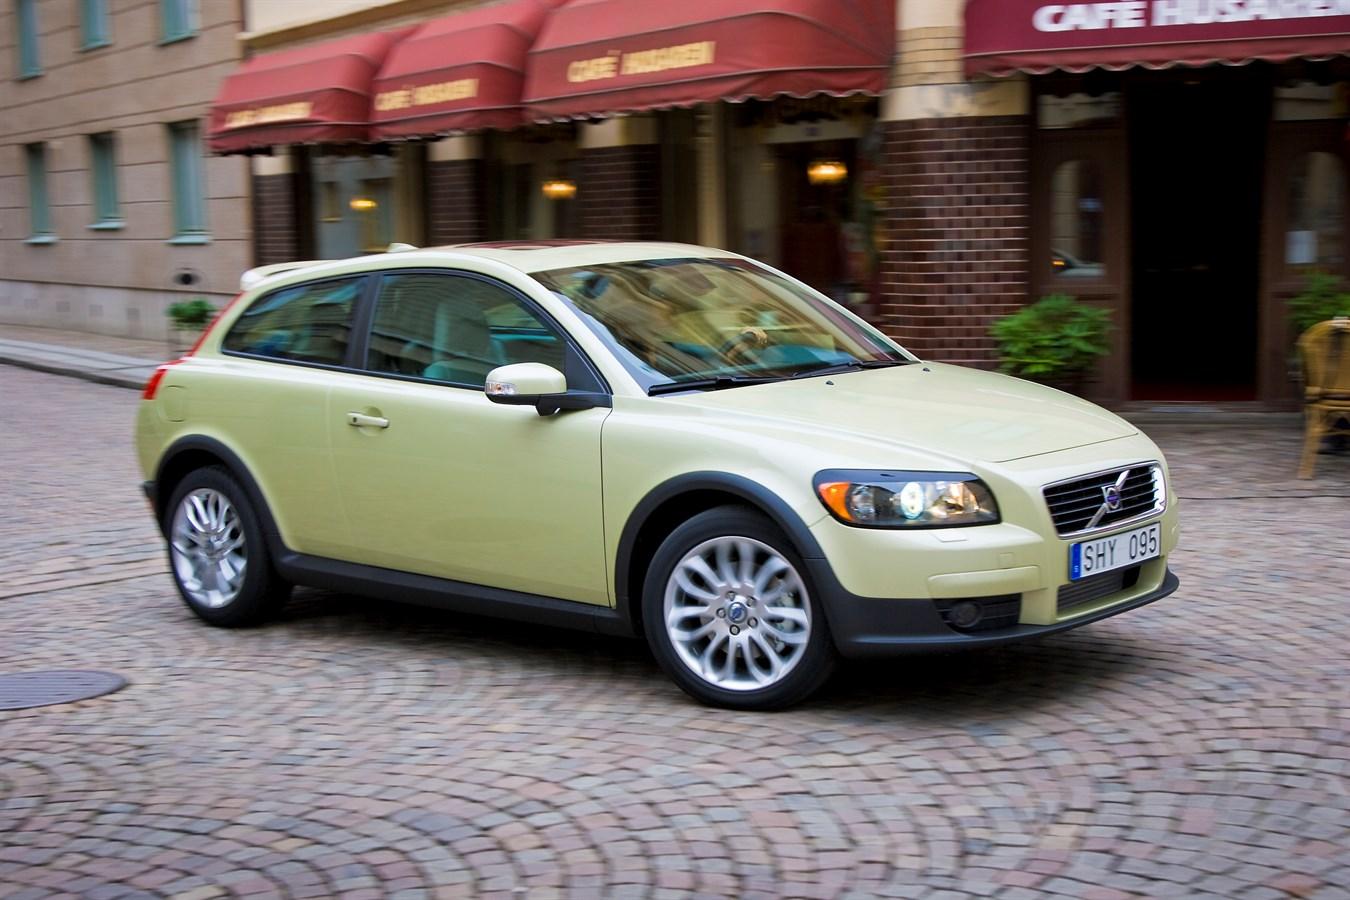 Volvo C30 Model Year 2008 Volvo Cars Global Media Newsroom